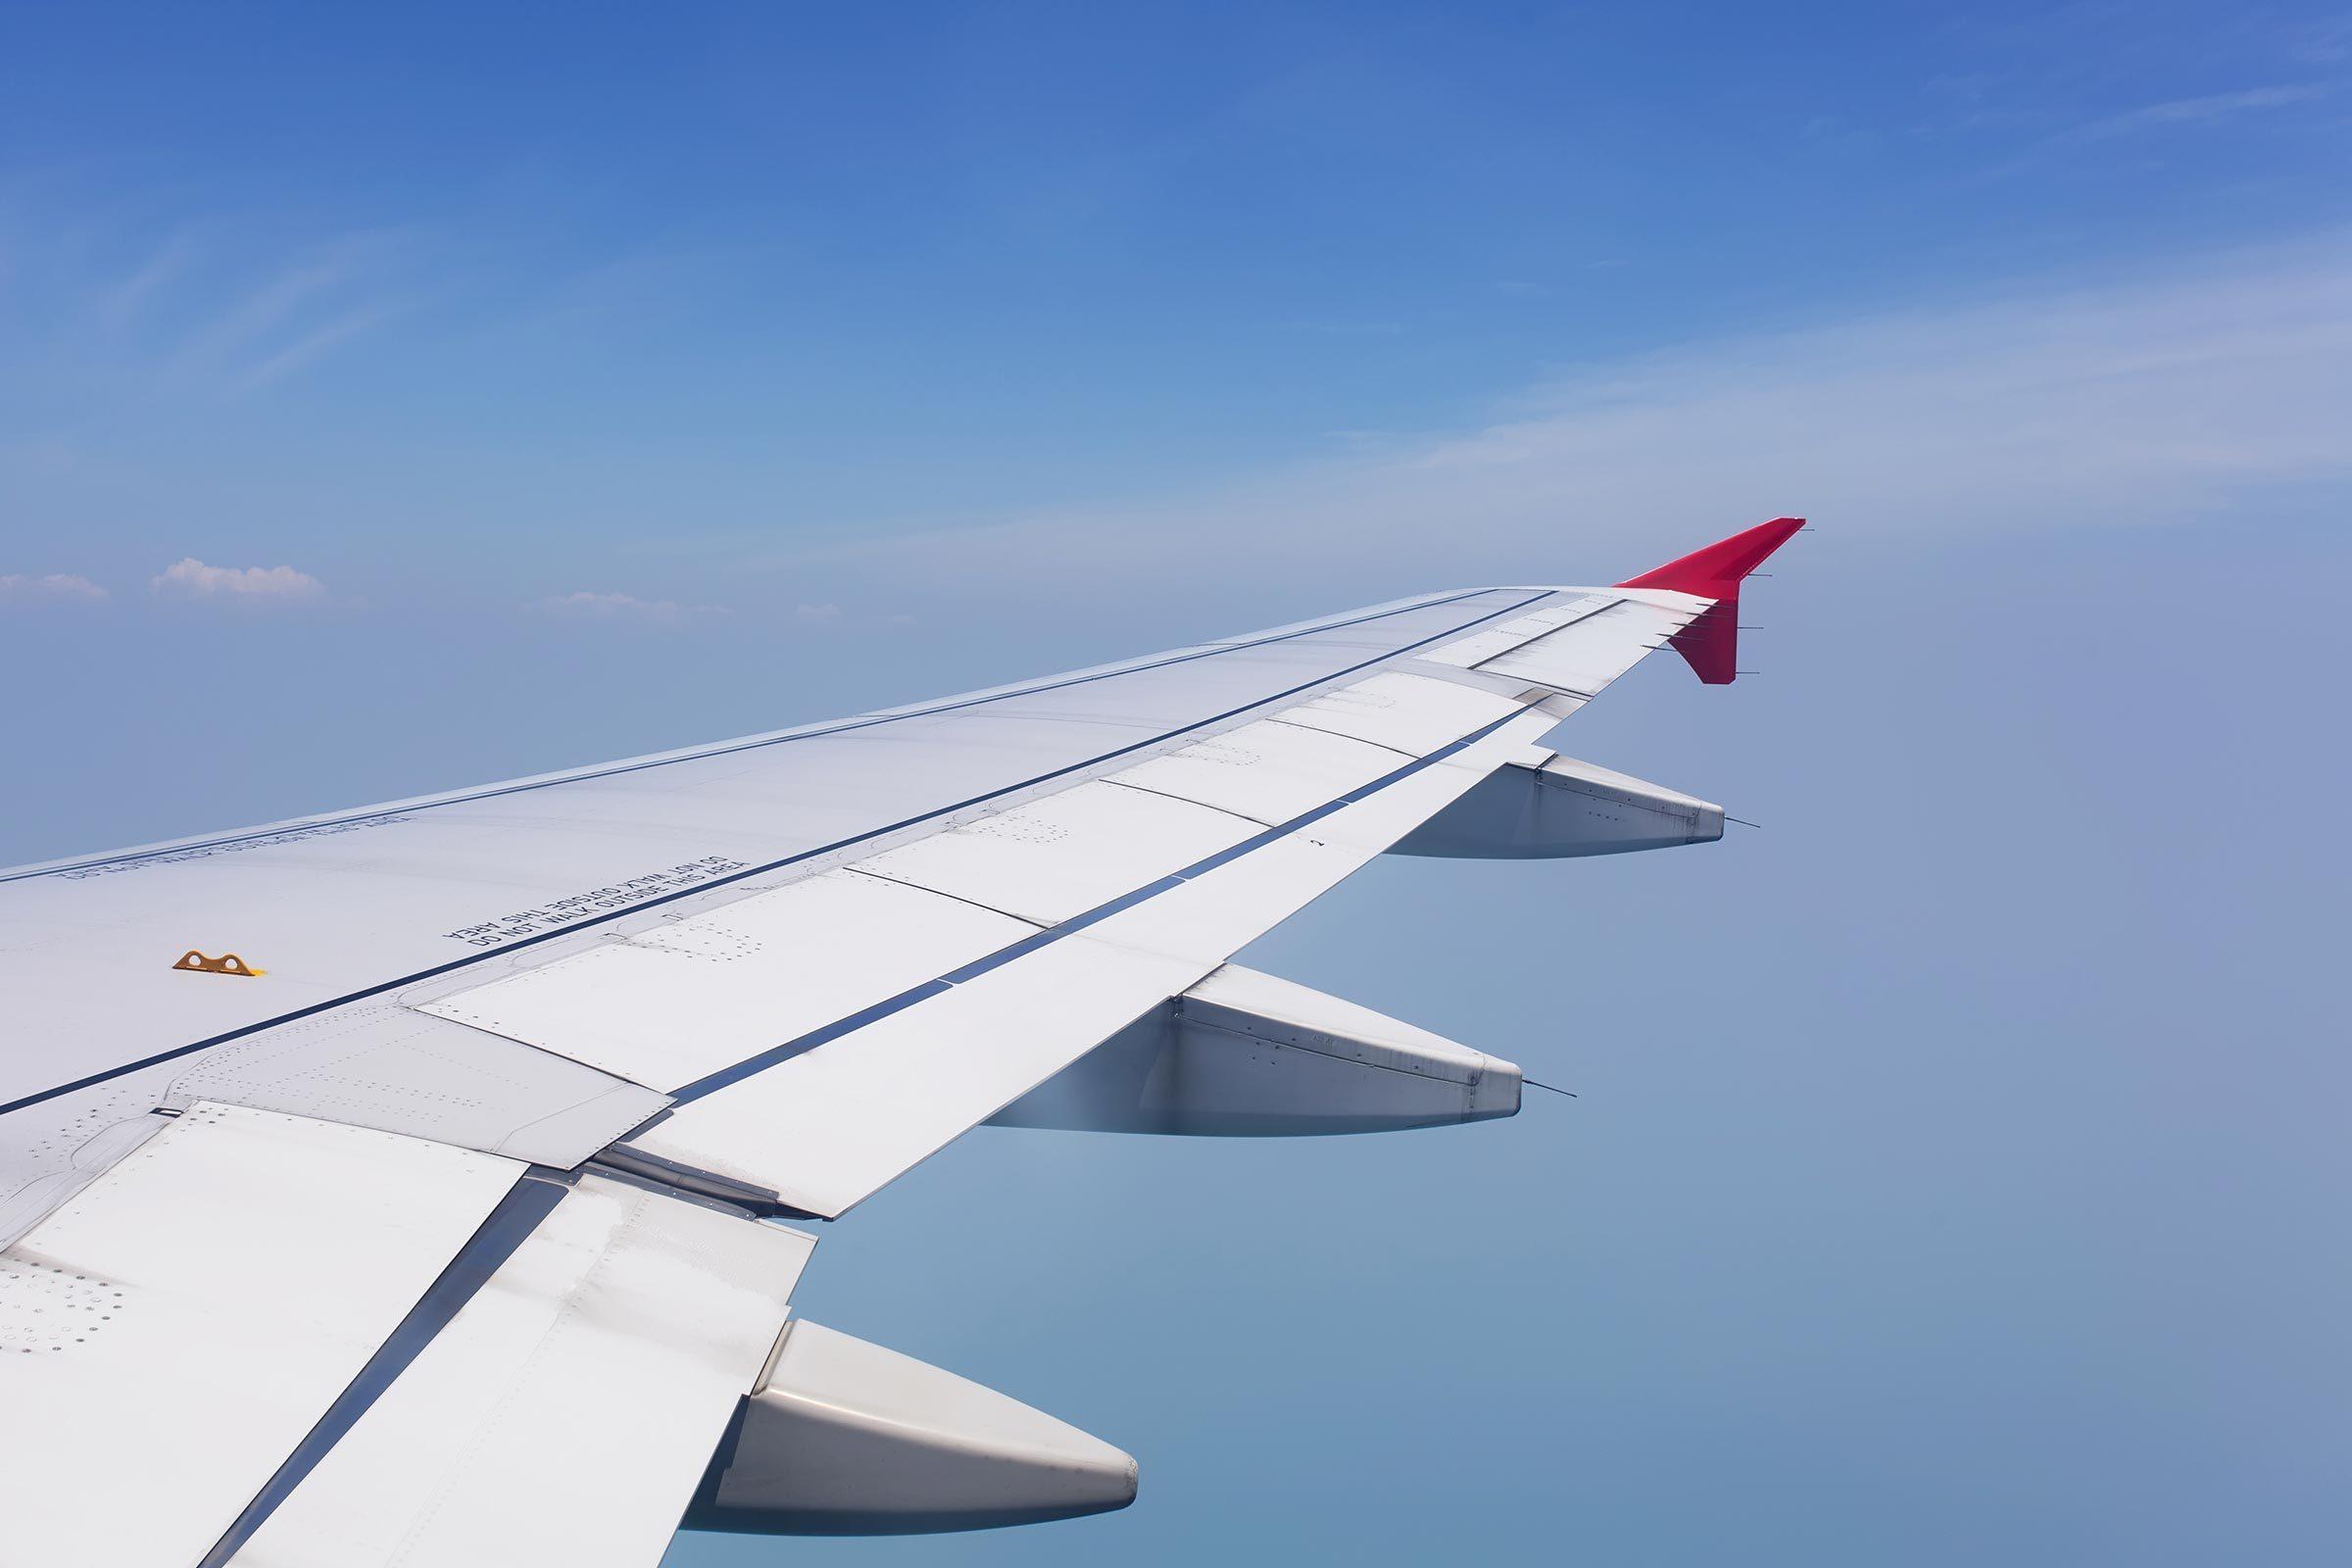 airplane flight wing